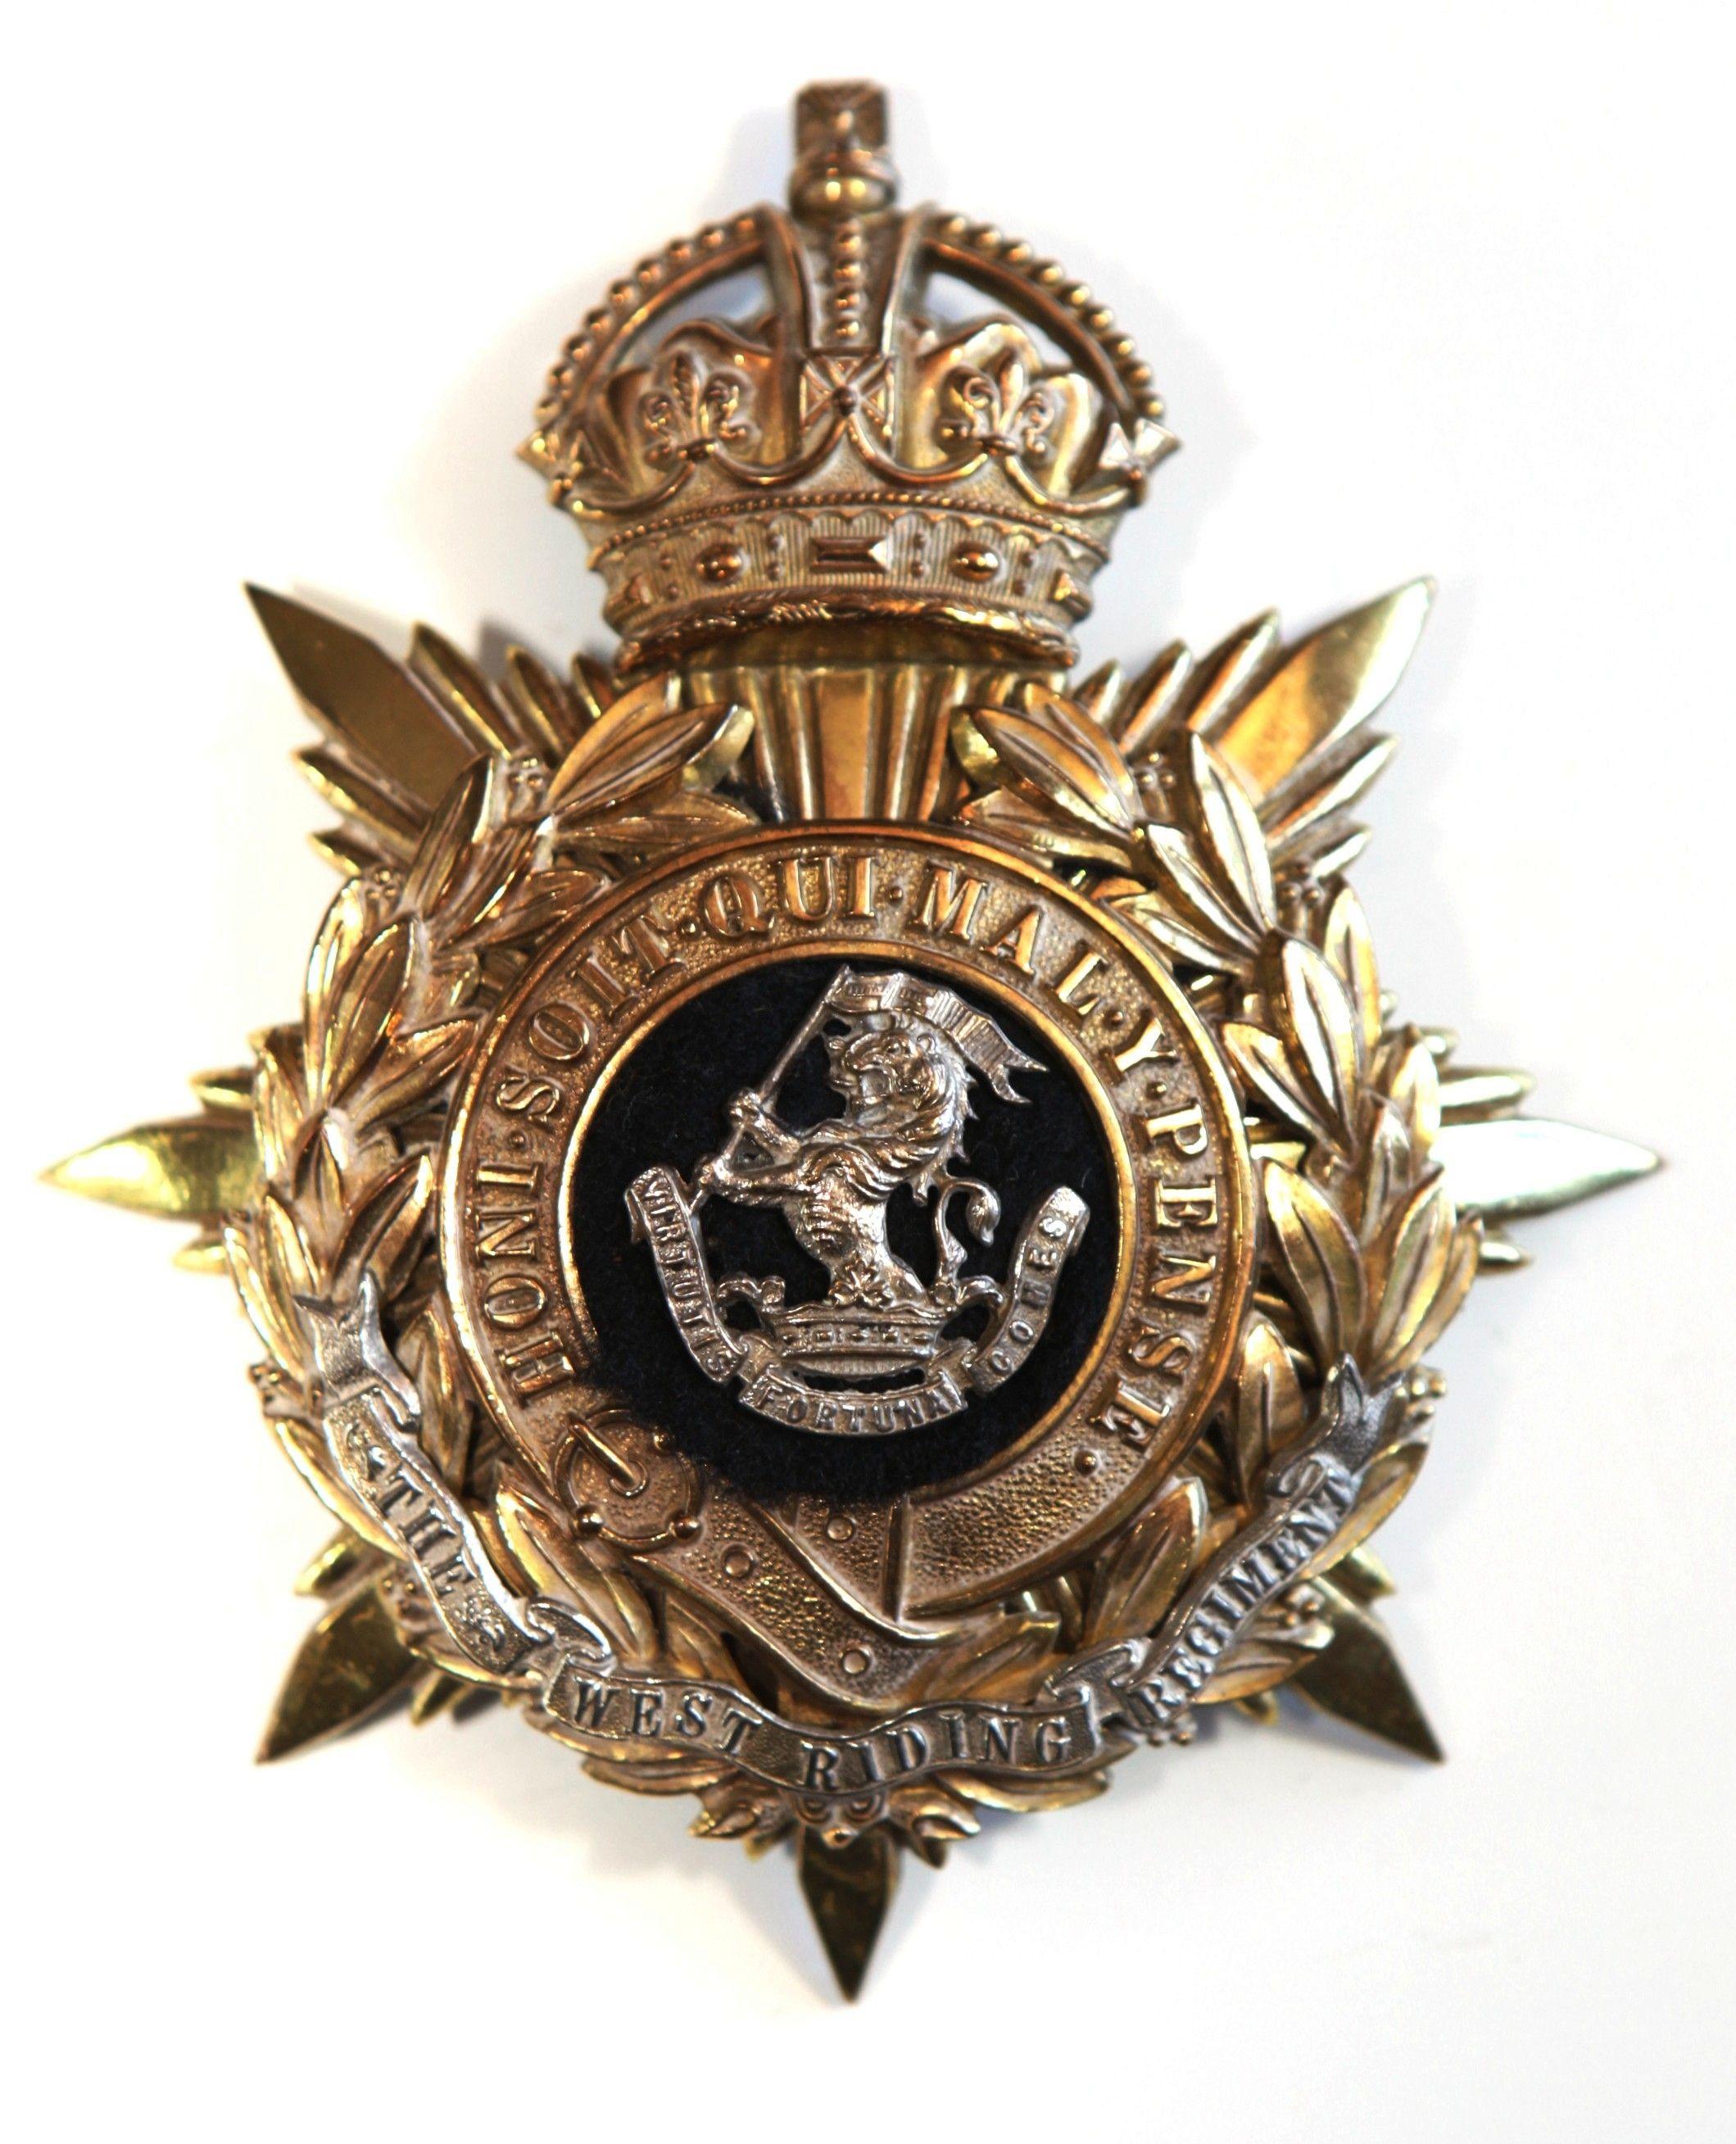 The Duke of Wellingtons (West Riding) Regiment Helmet Plate Badge